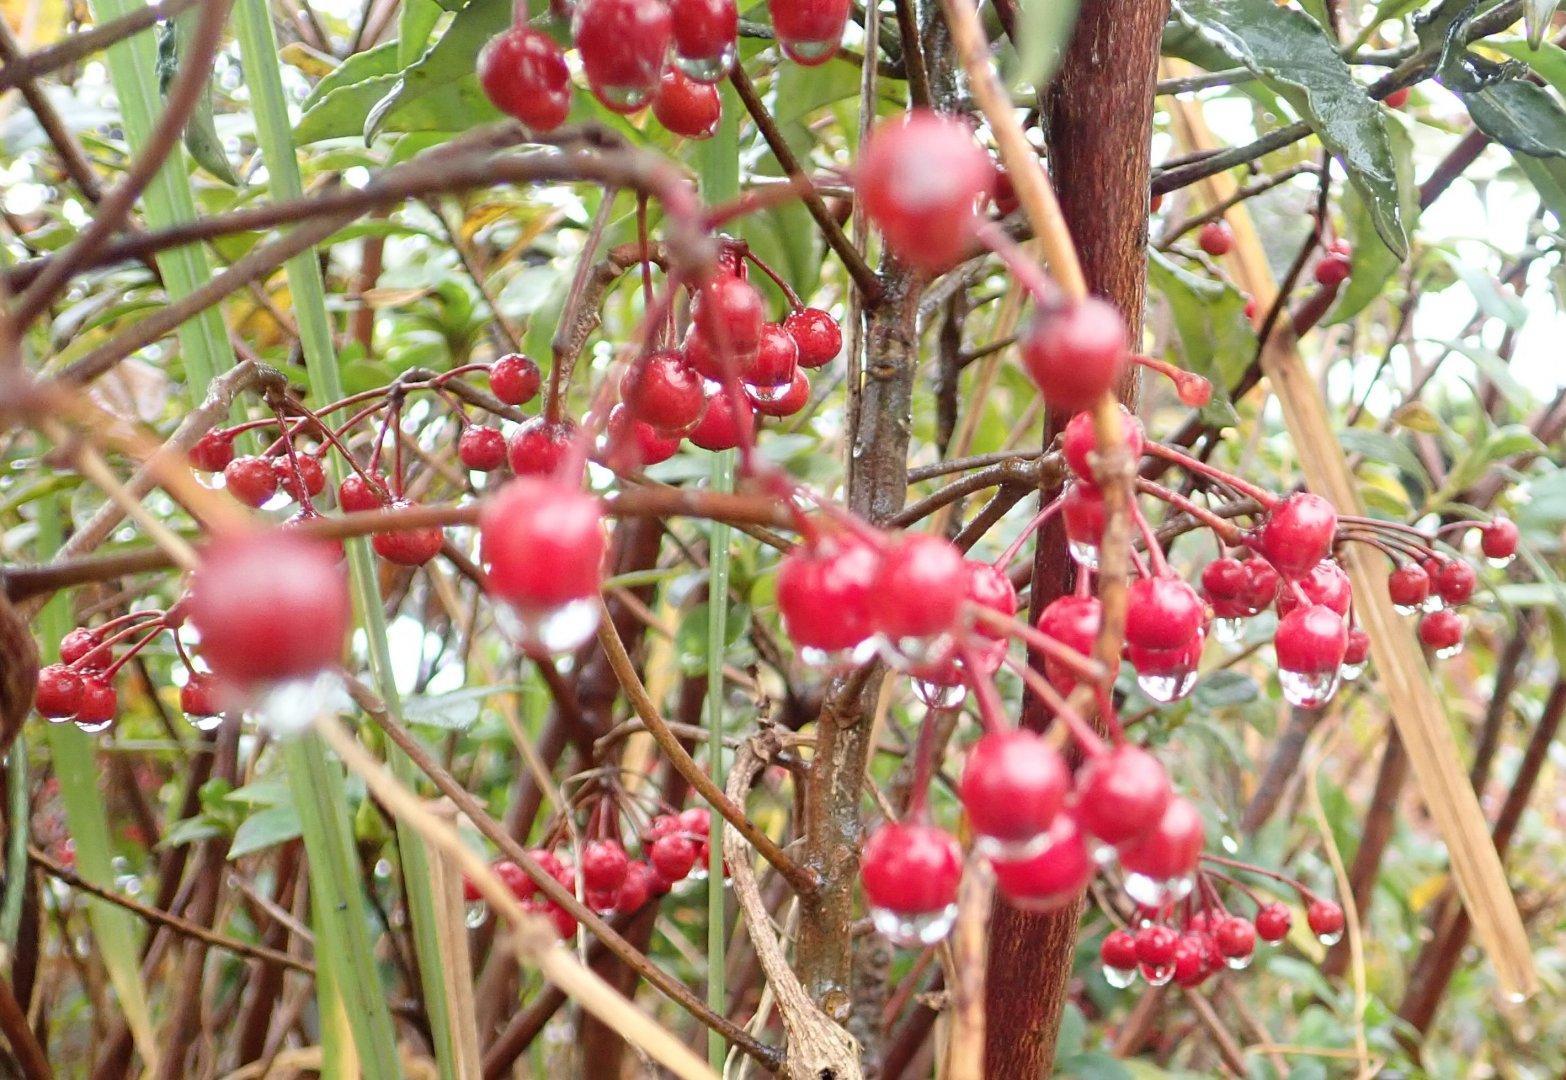 Rain on Berries 2